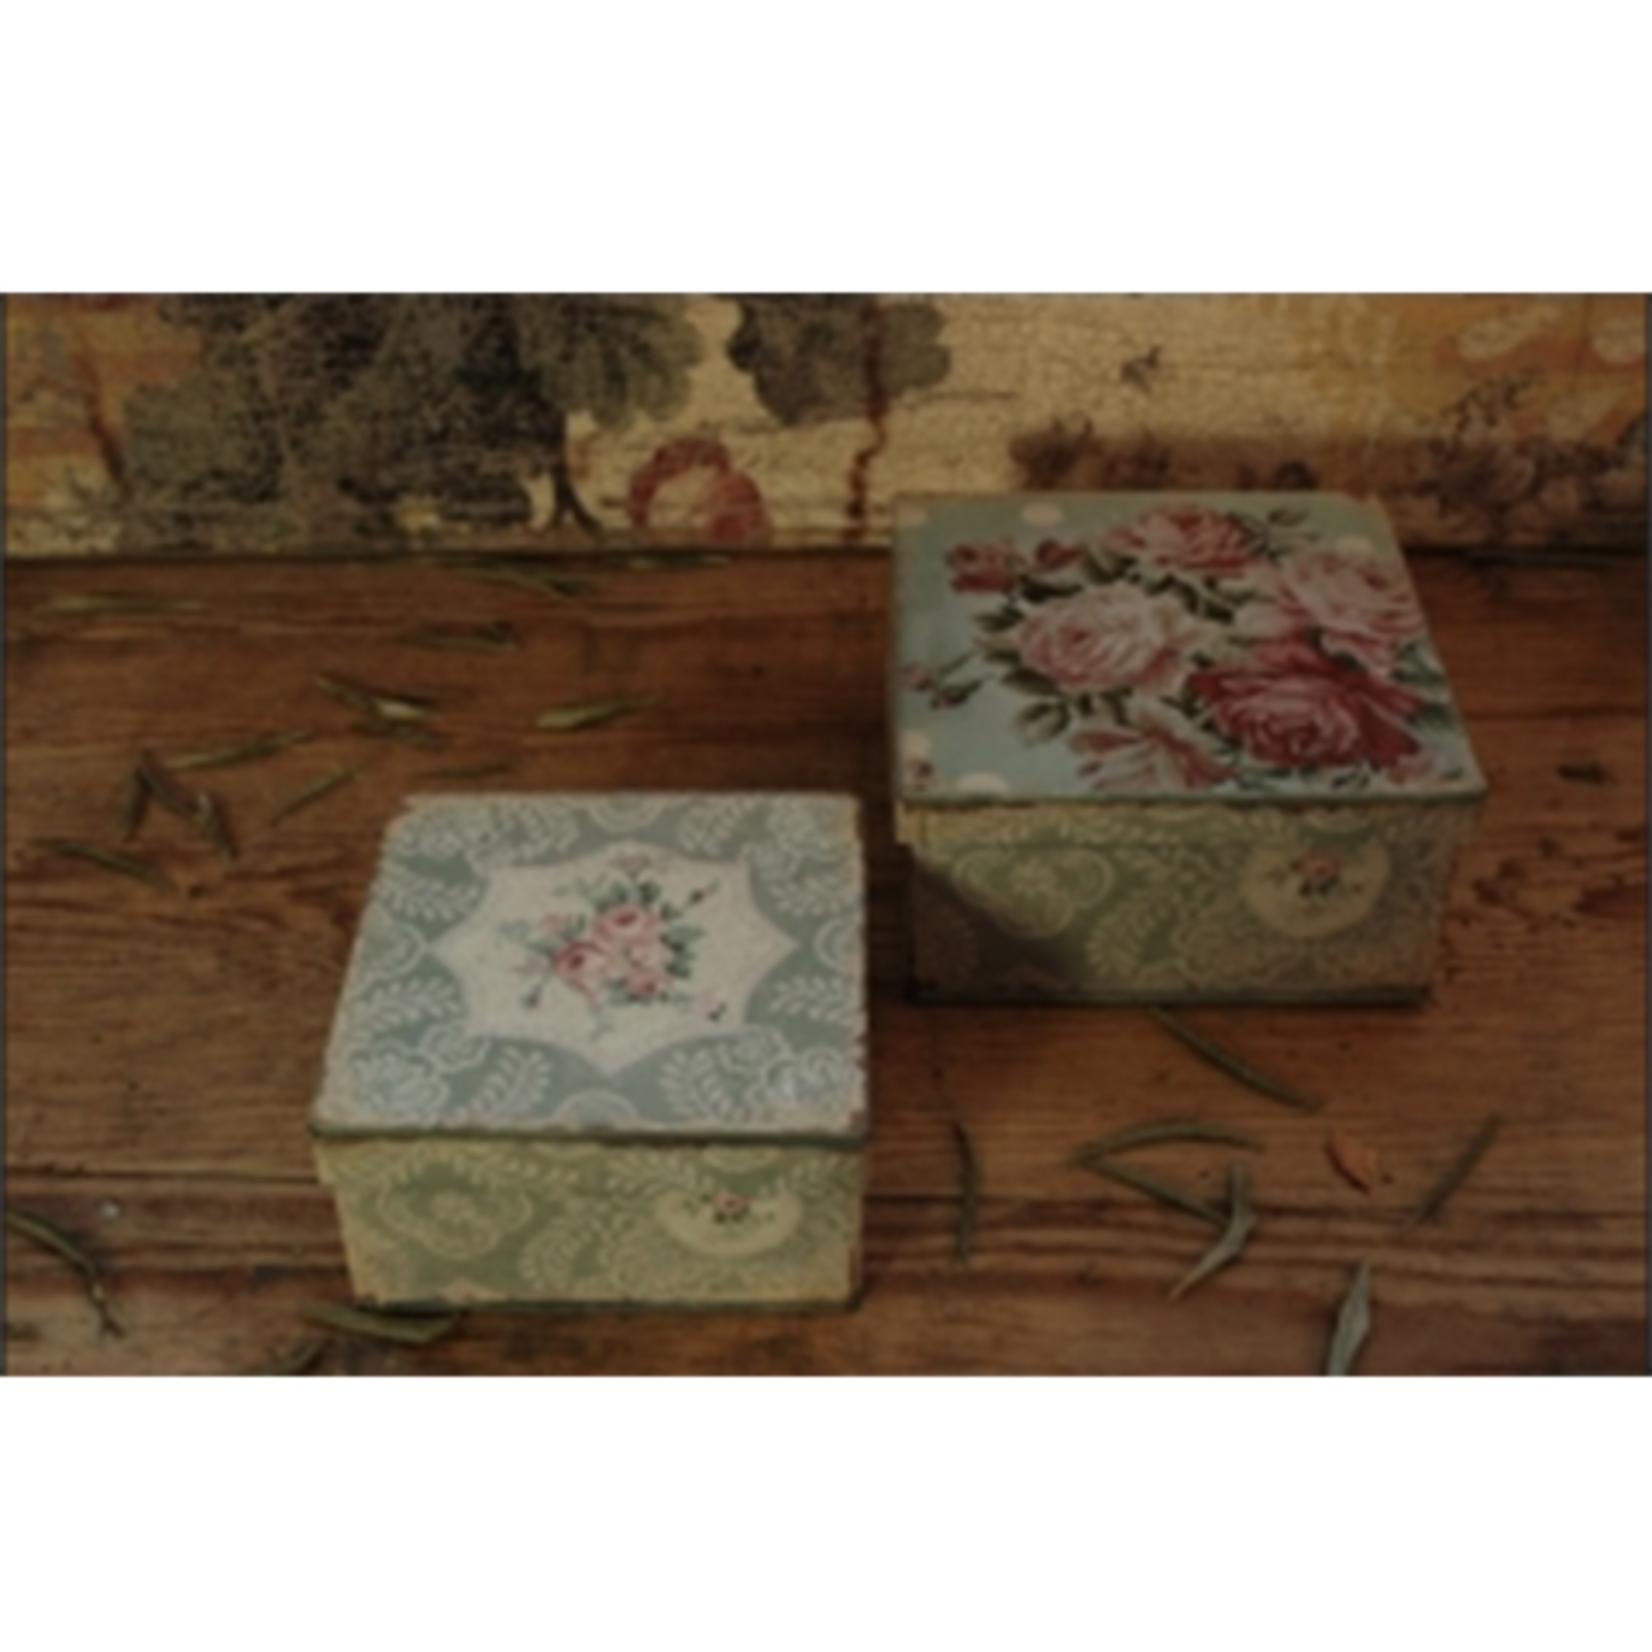 CHEHOMA SET 2 SQUARE BOXES FLOWER DESIGN